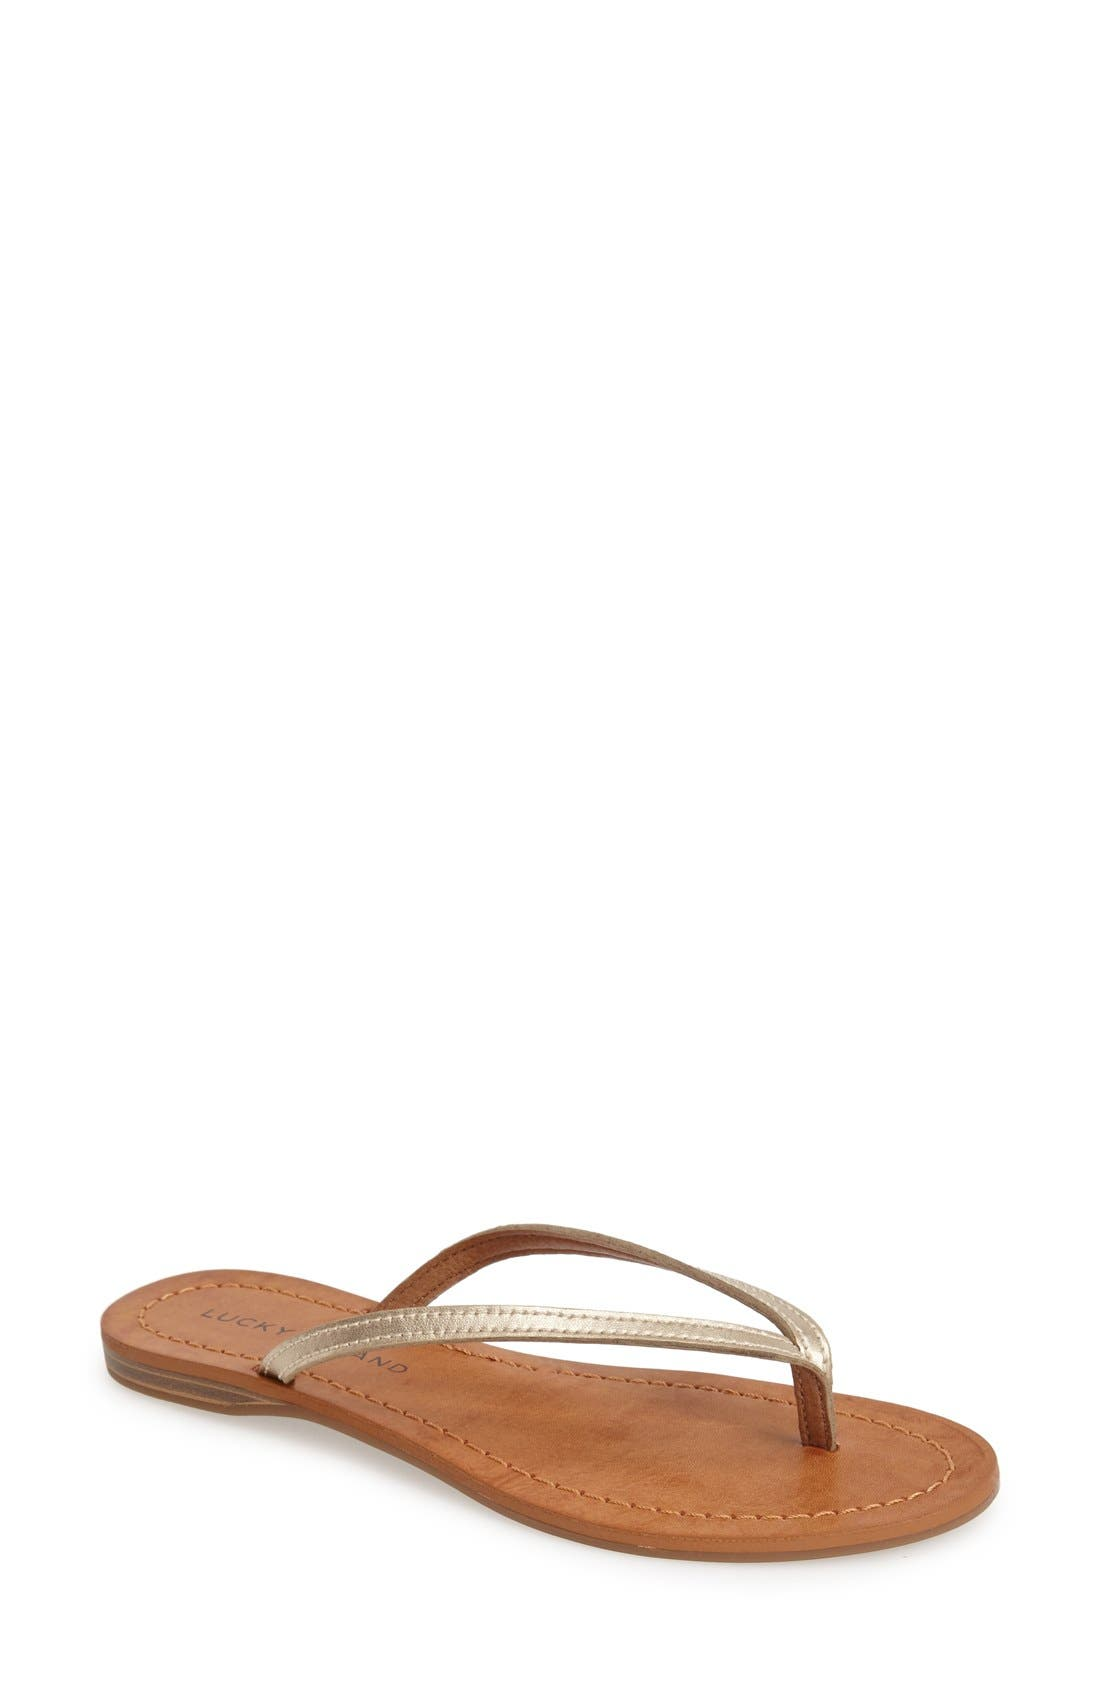 Main Image - Lucky Brand 'Amberr' Leather Thong Sandal (Women)